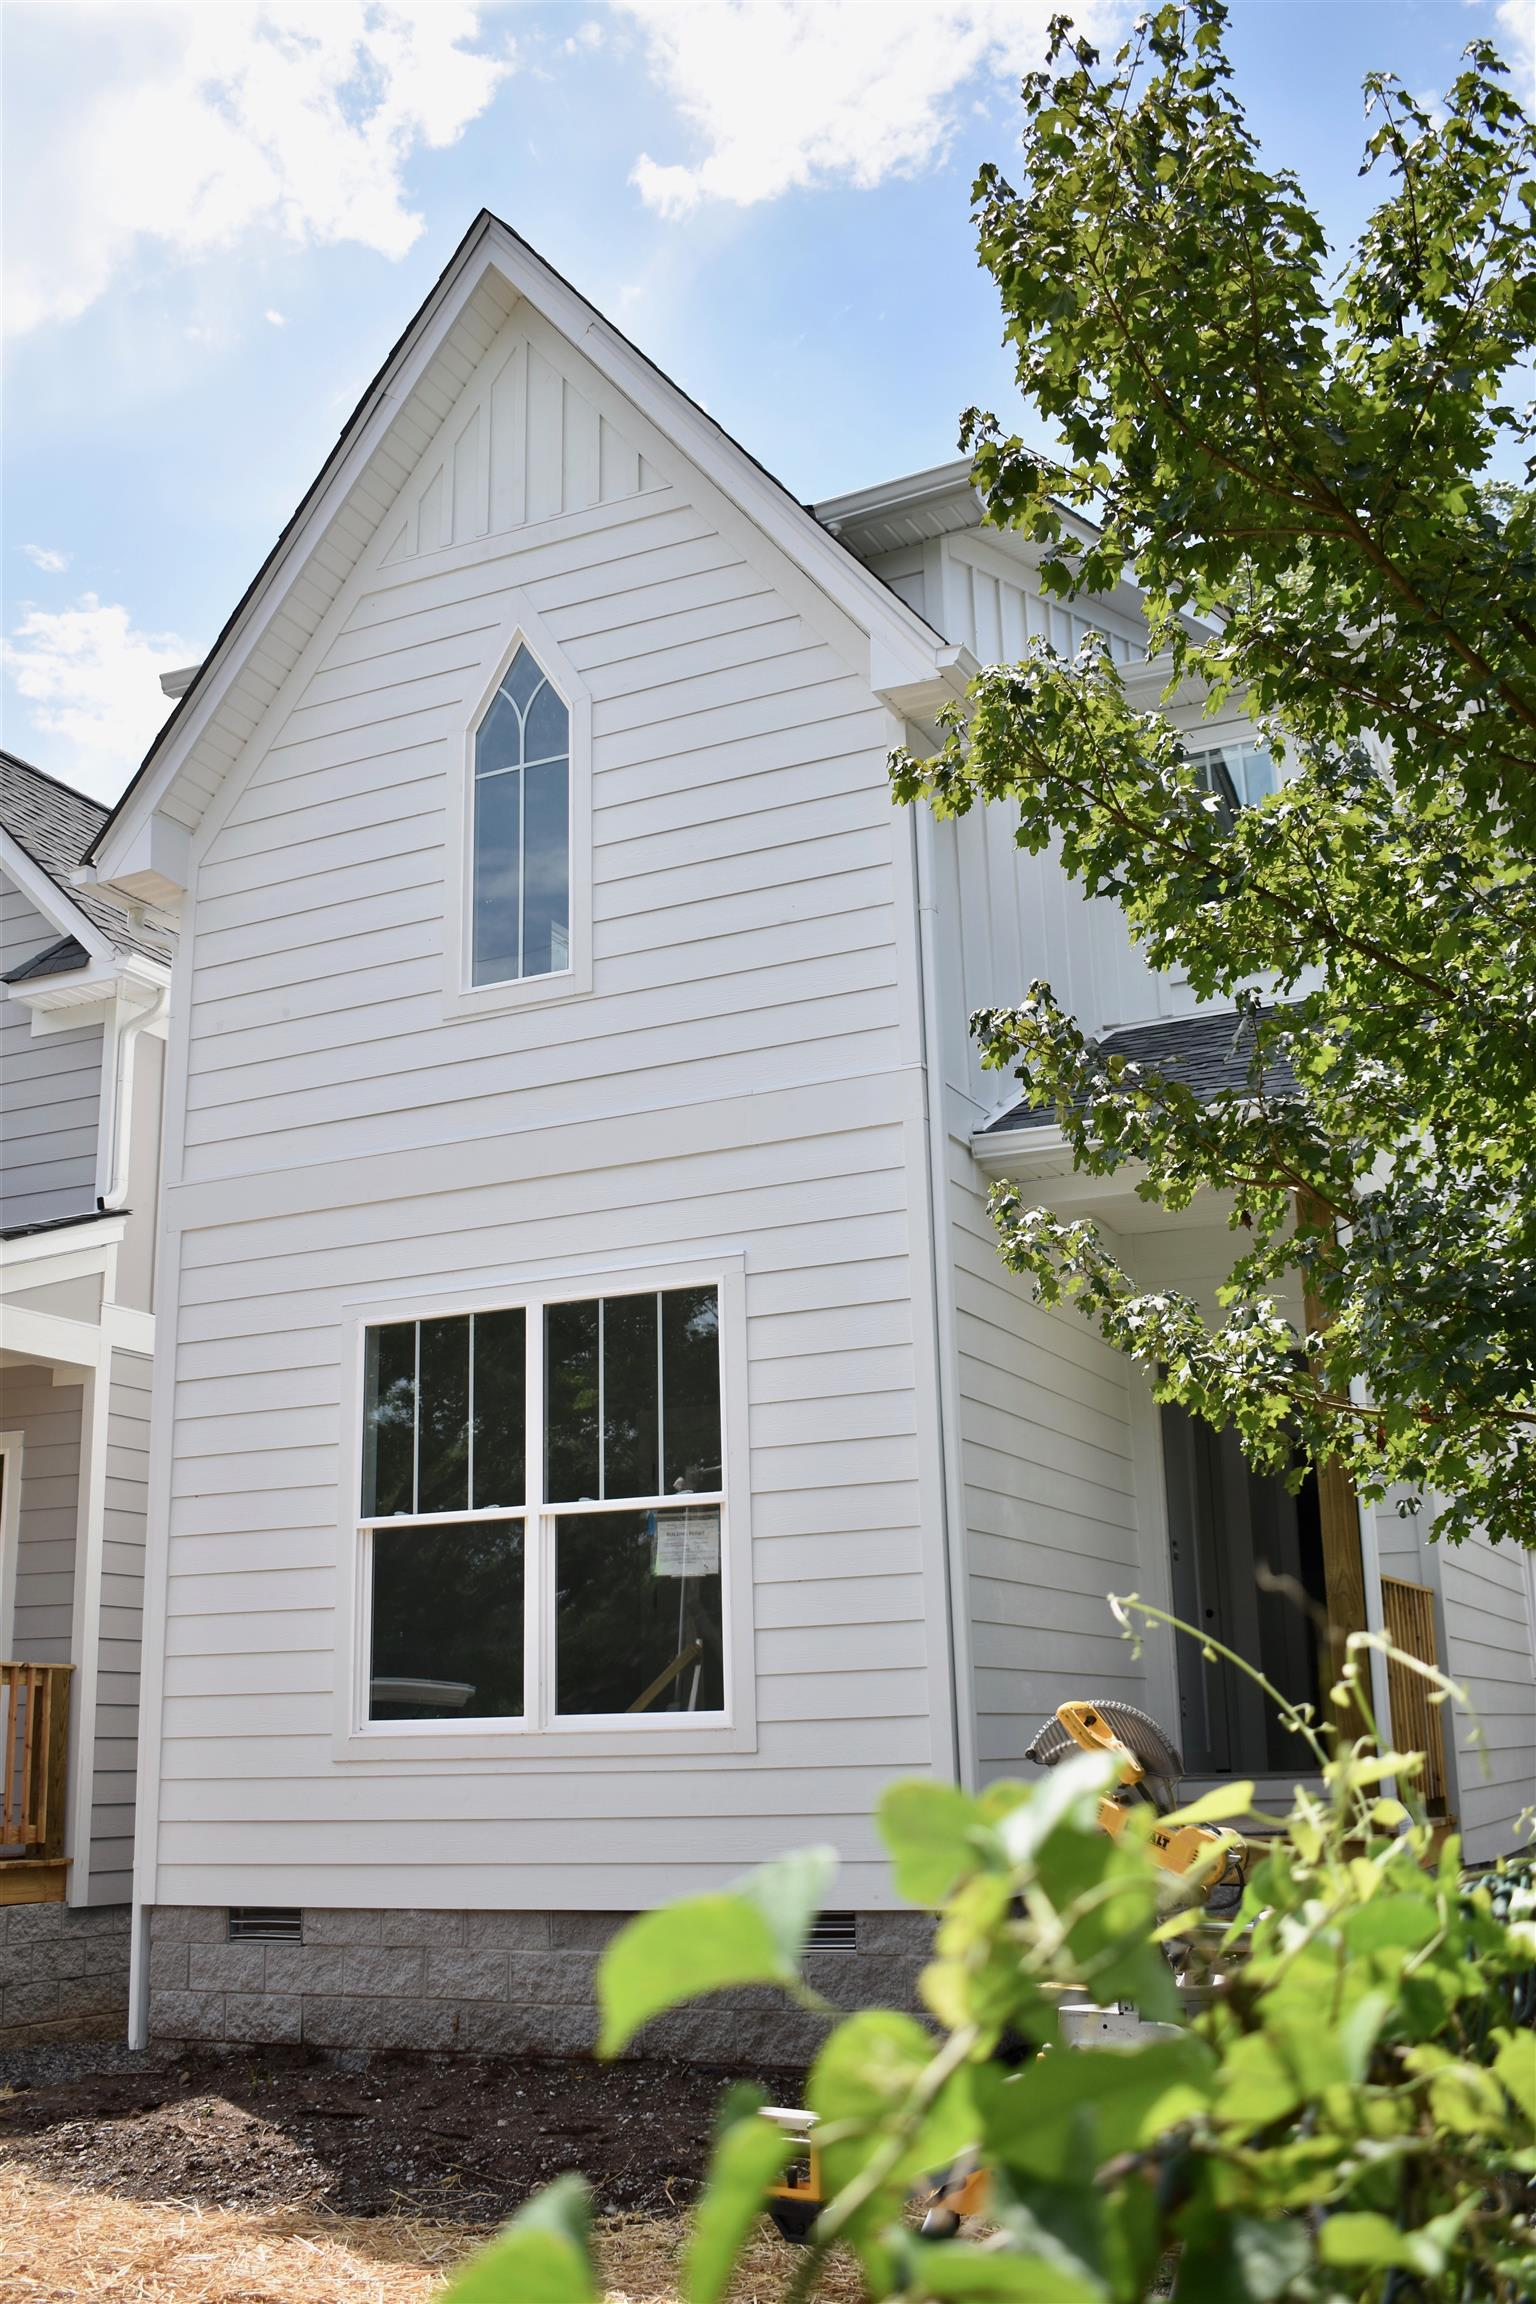 304B Vivelle Ave, Nashville, TN 37210 - Nashville, TN real estate listing